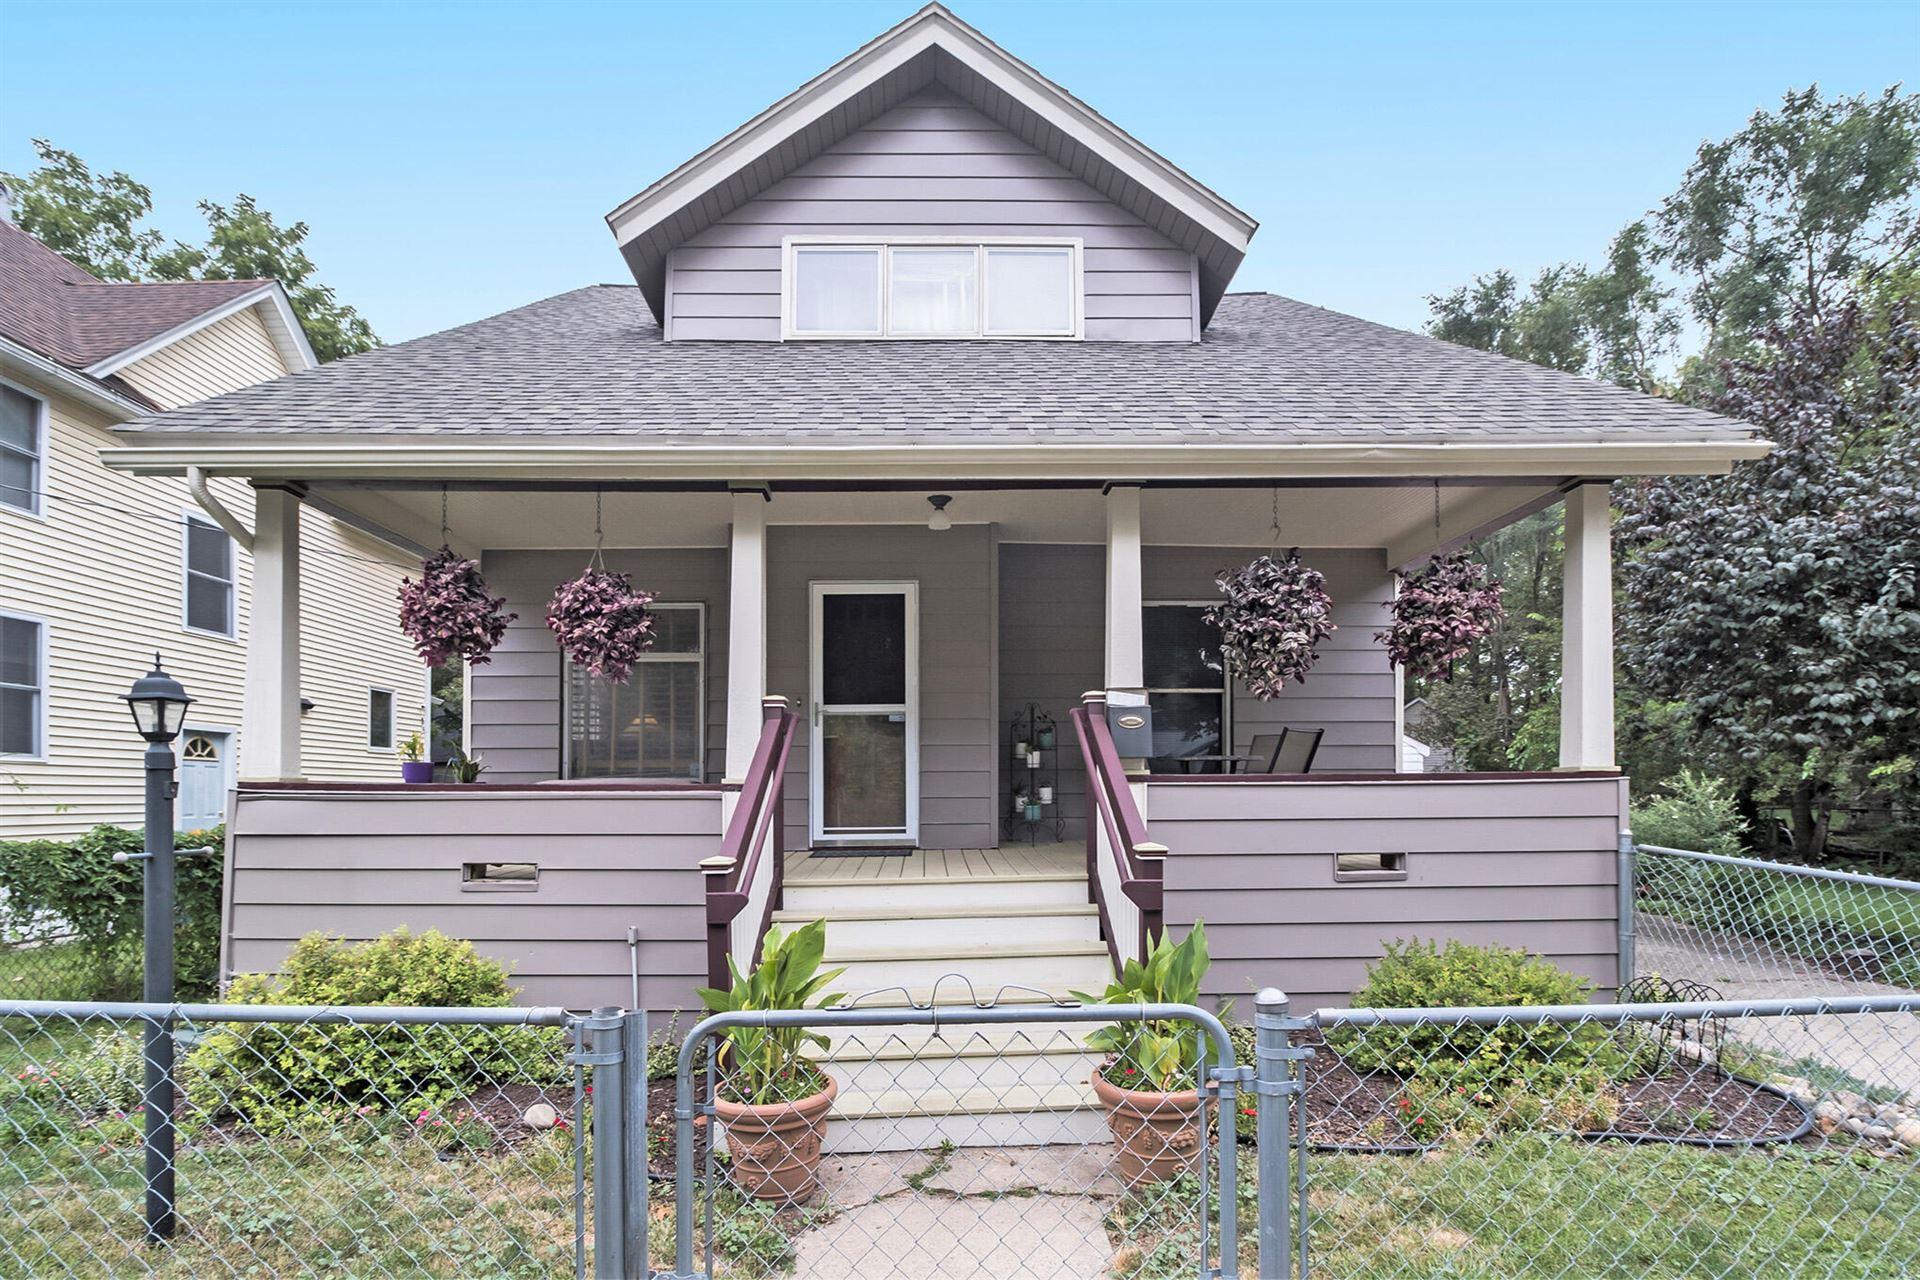 821 Phillips Street, Kalamazoo, MI 49001 - MLS#: 21106064